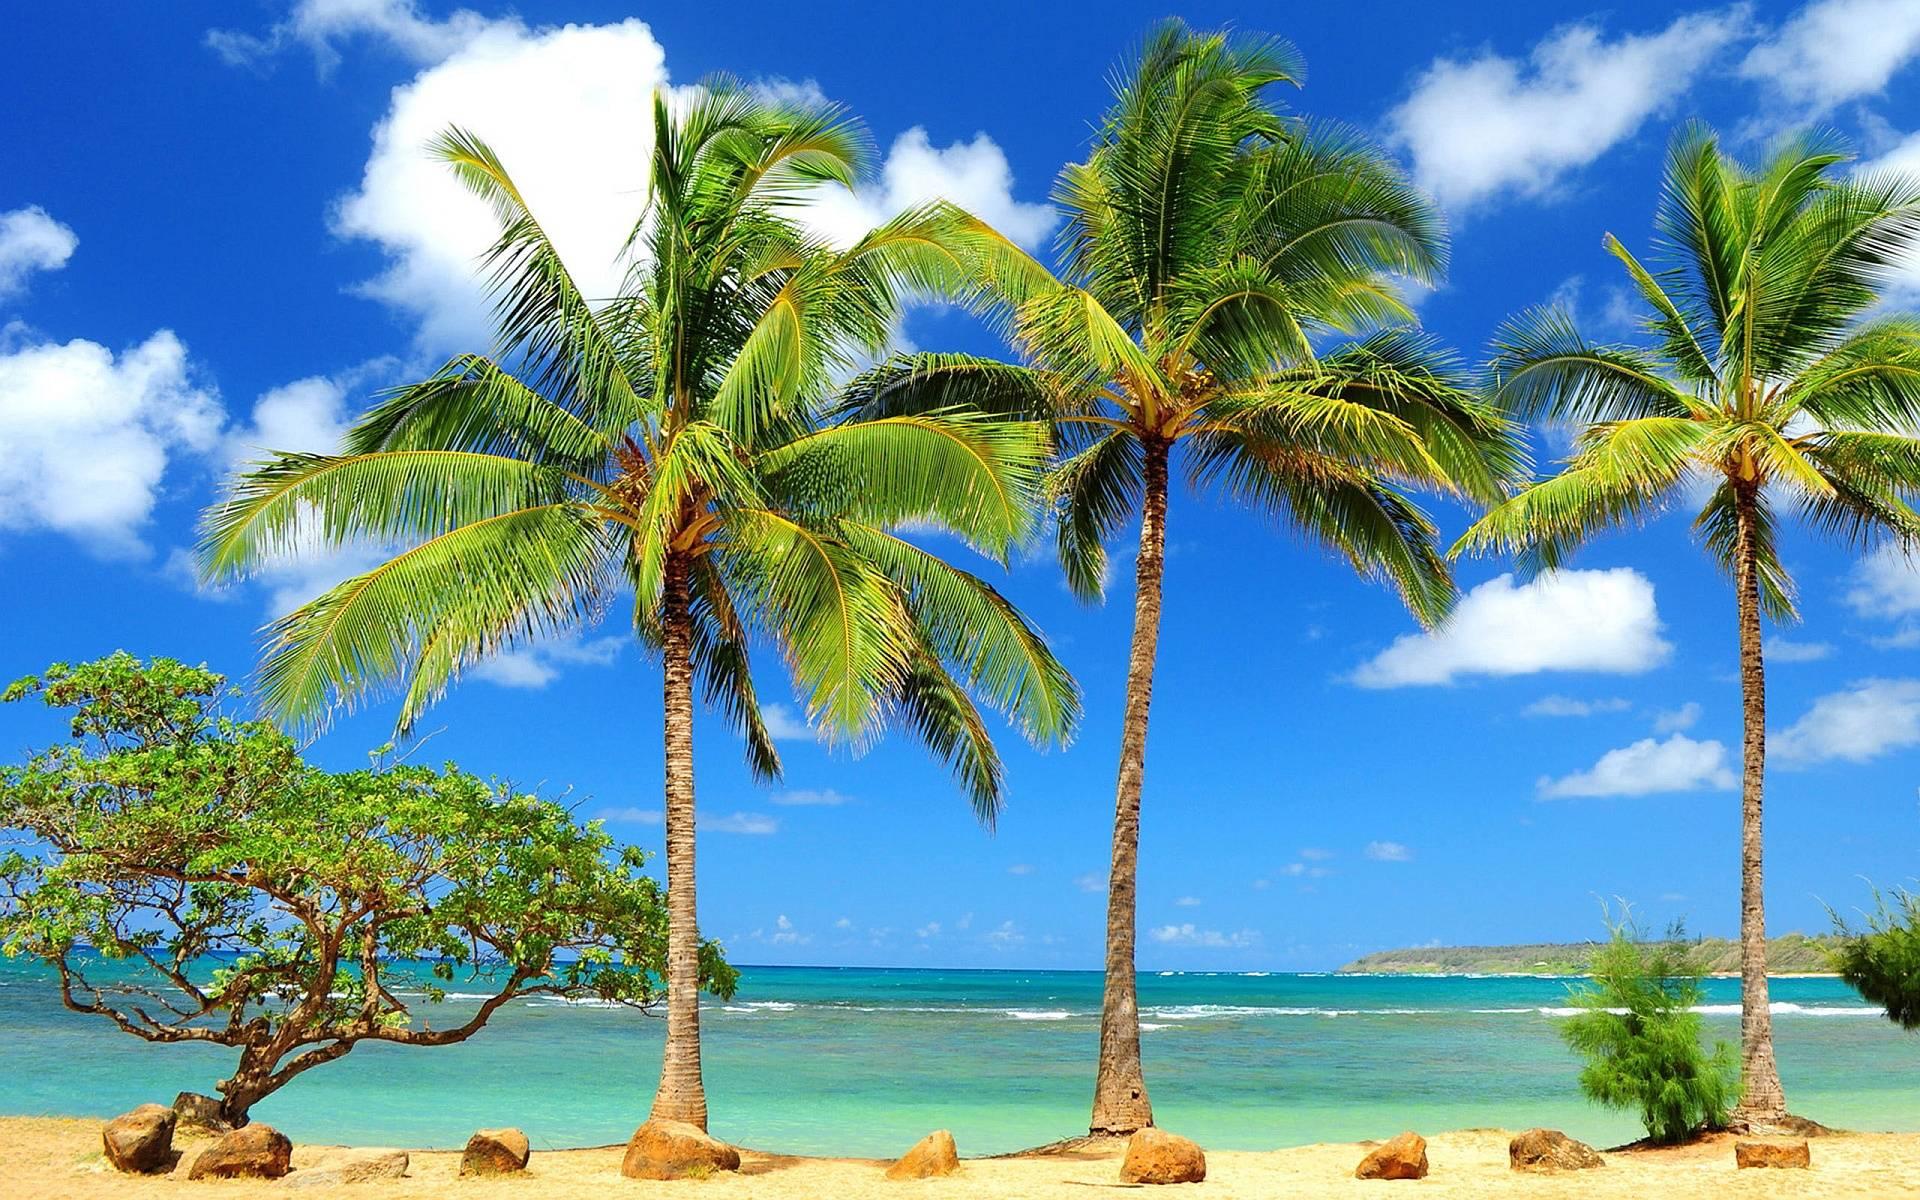 Beach Palm Tree Wallpaper 21 Atlantis Boat Rental